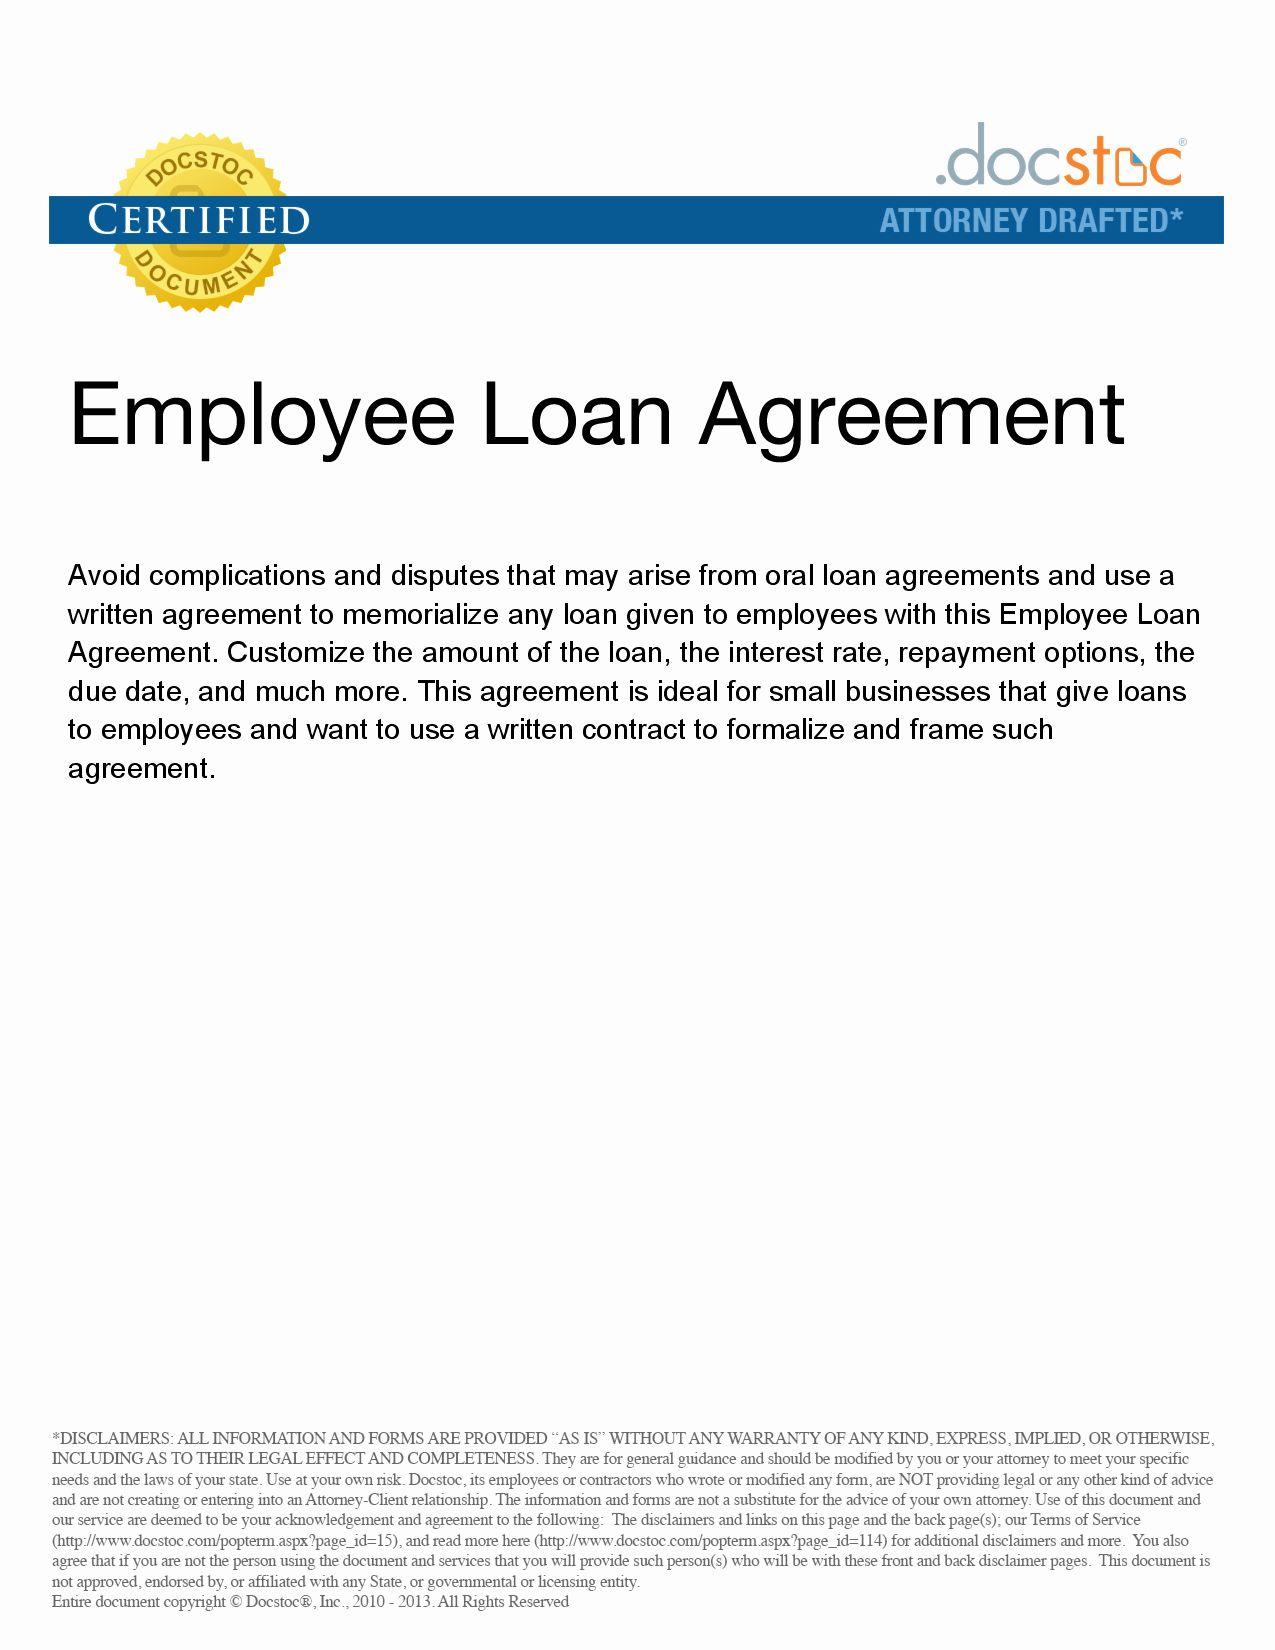 promissory note template for personal loan in 2020 best resume format job application major incident manager sample esl teacher cv